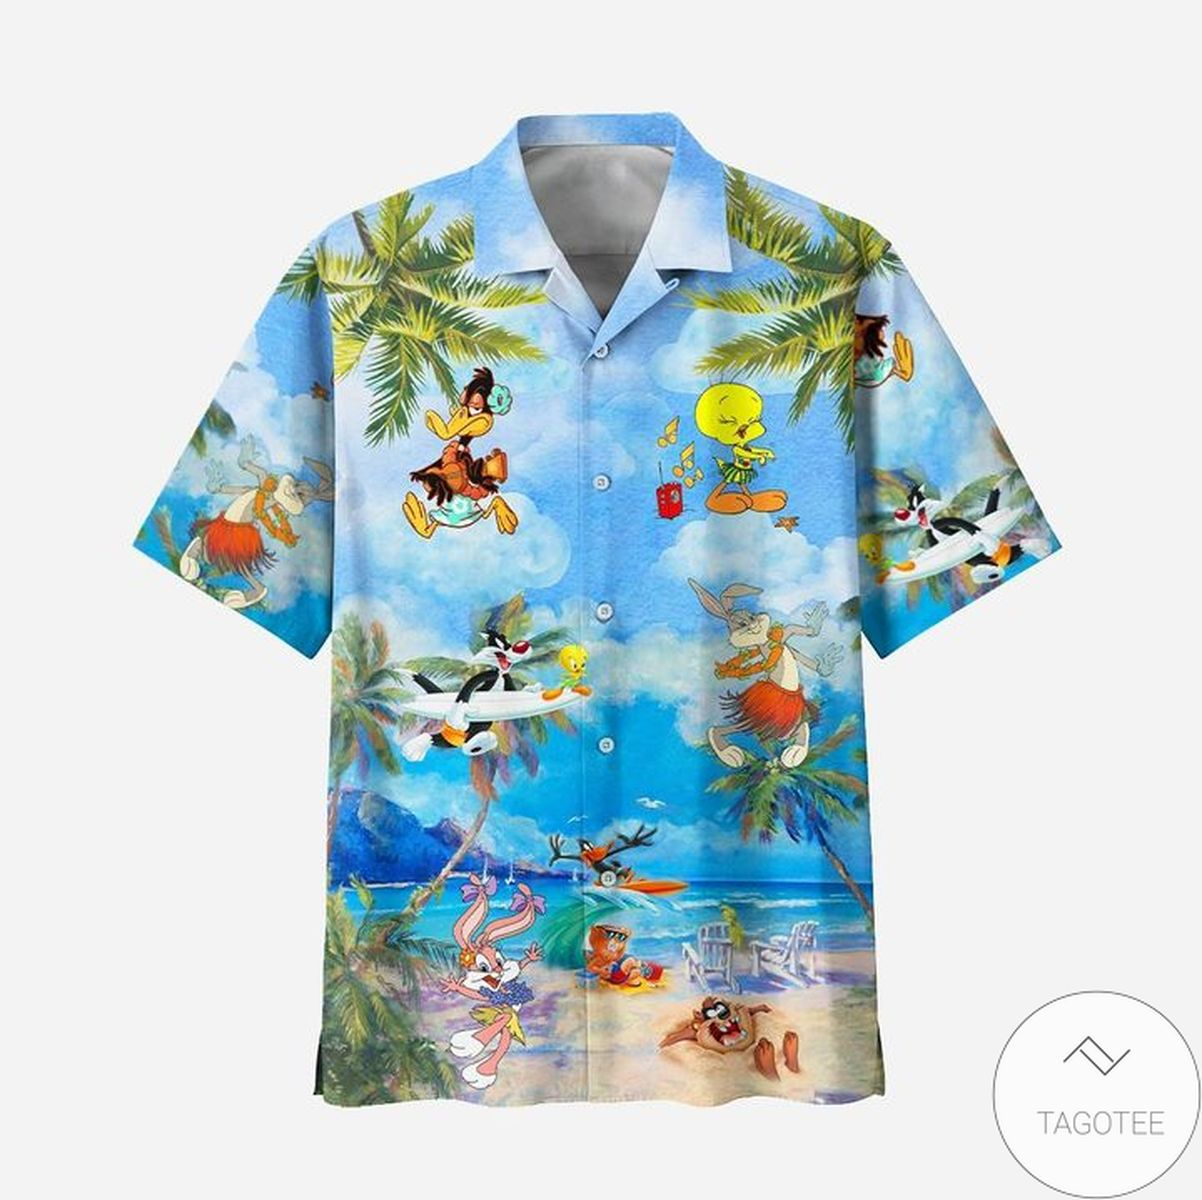 Daffy Duck, Tweety, Sylvester, Yosemite Sam, Porky Pig, Cartoon Beach Hawaiian Shirt